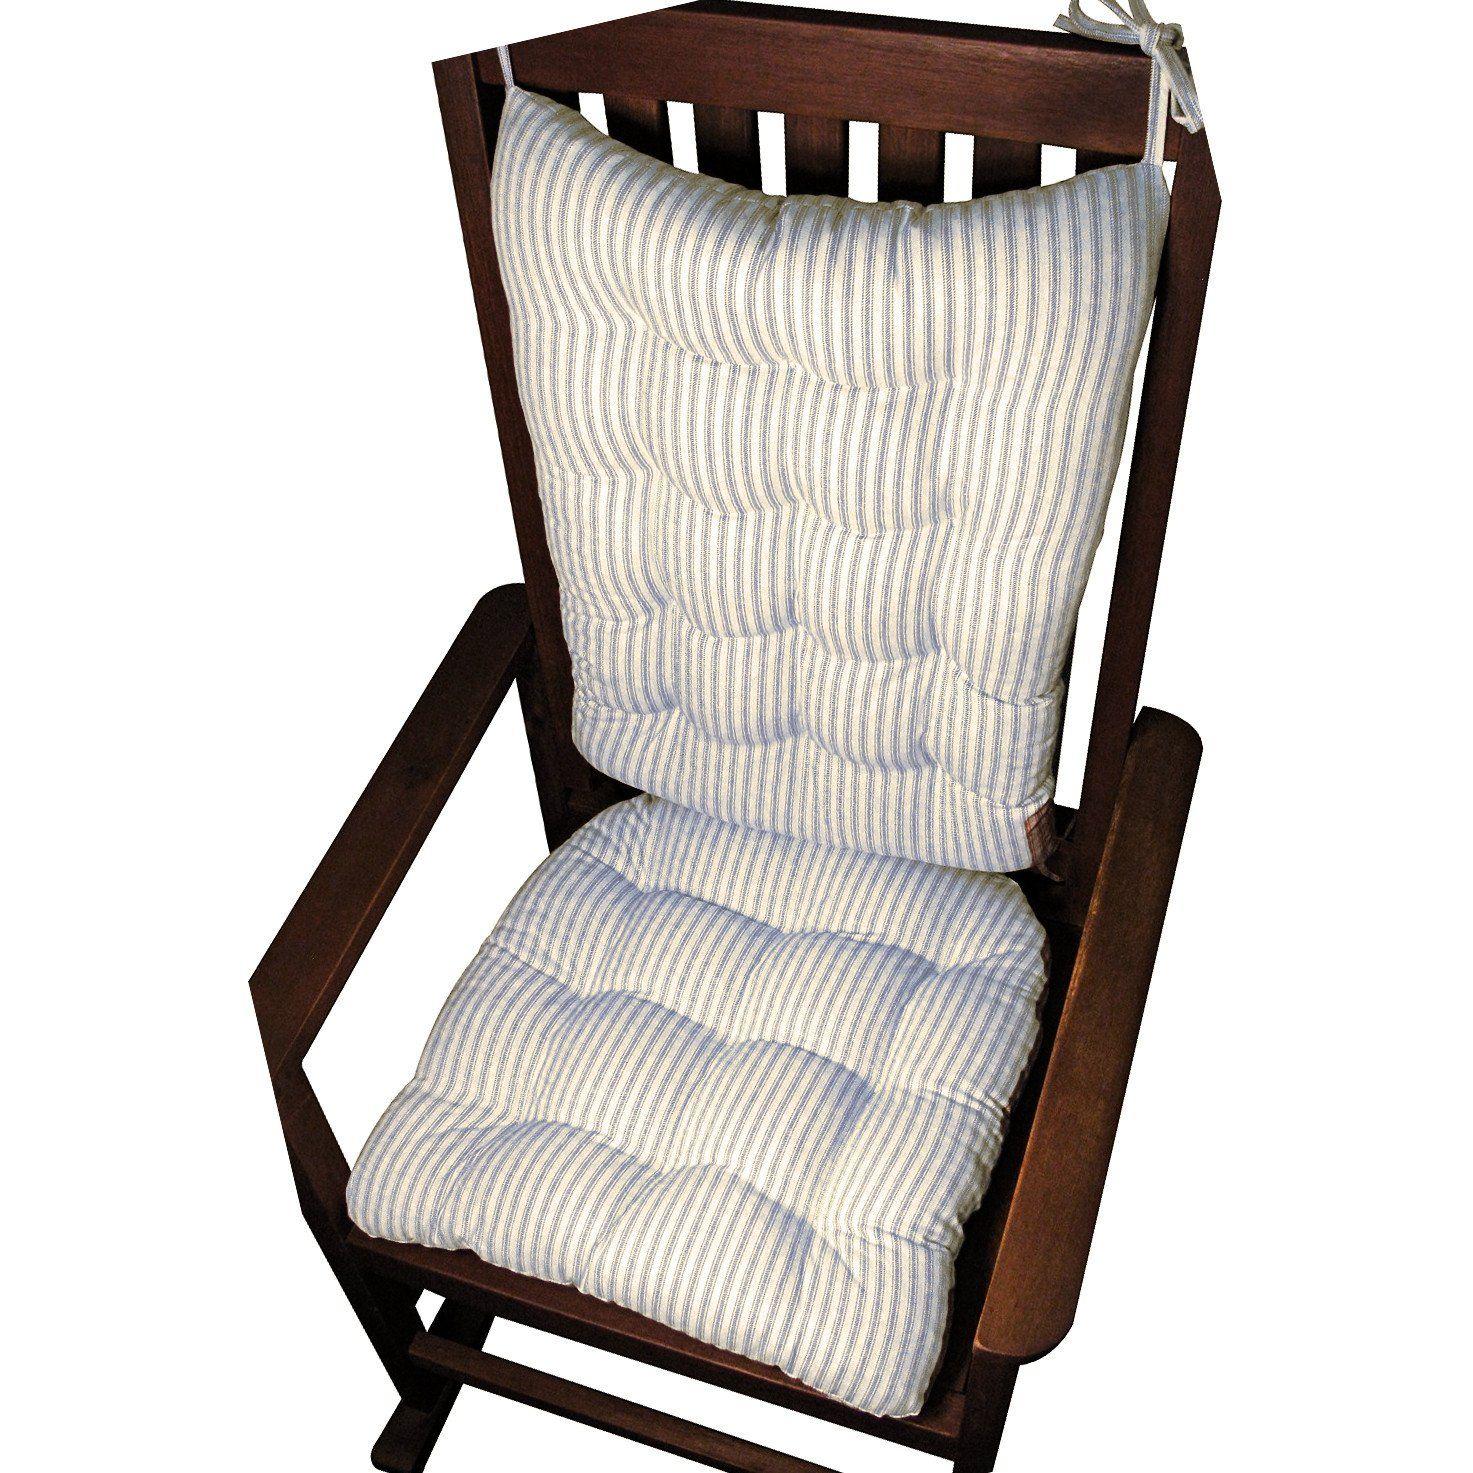 Ticking Stripe Navy Blue Rocking Chair Cushion Set Latex Foam Fill